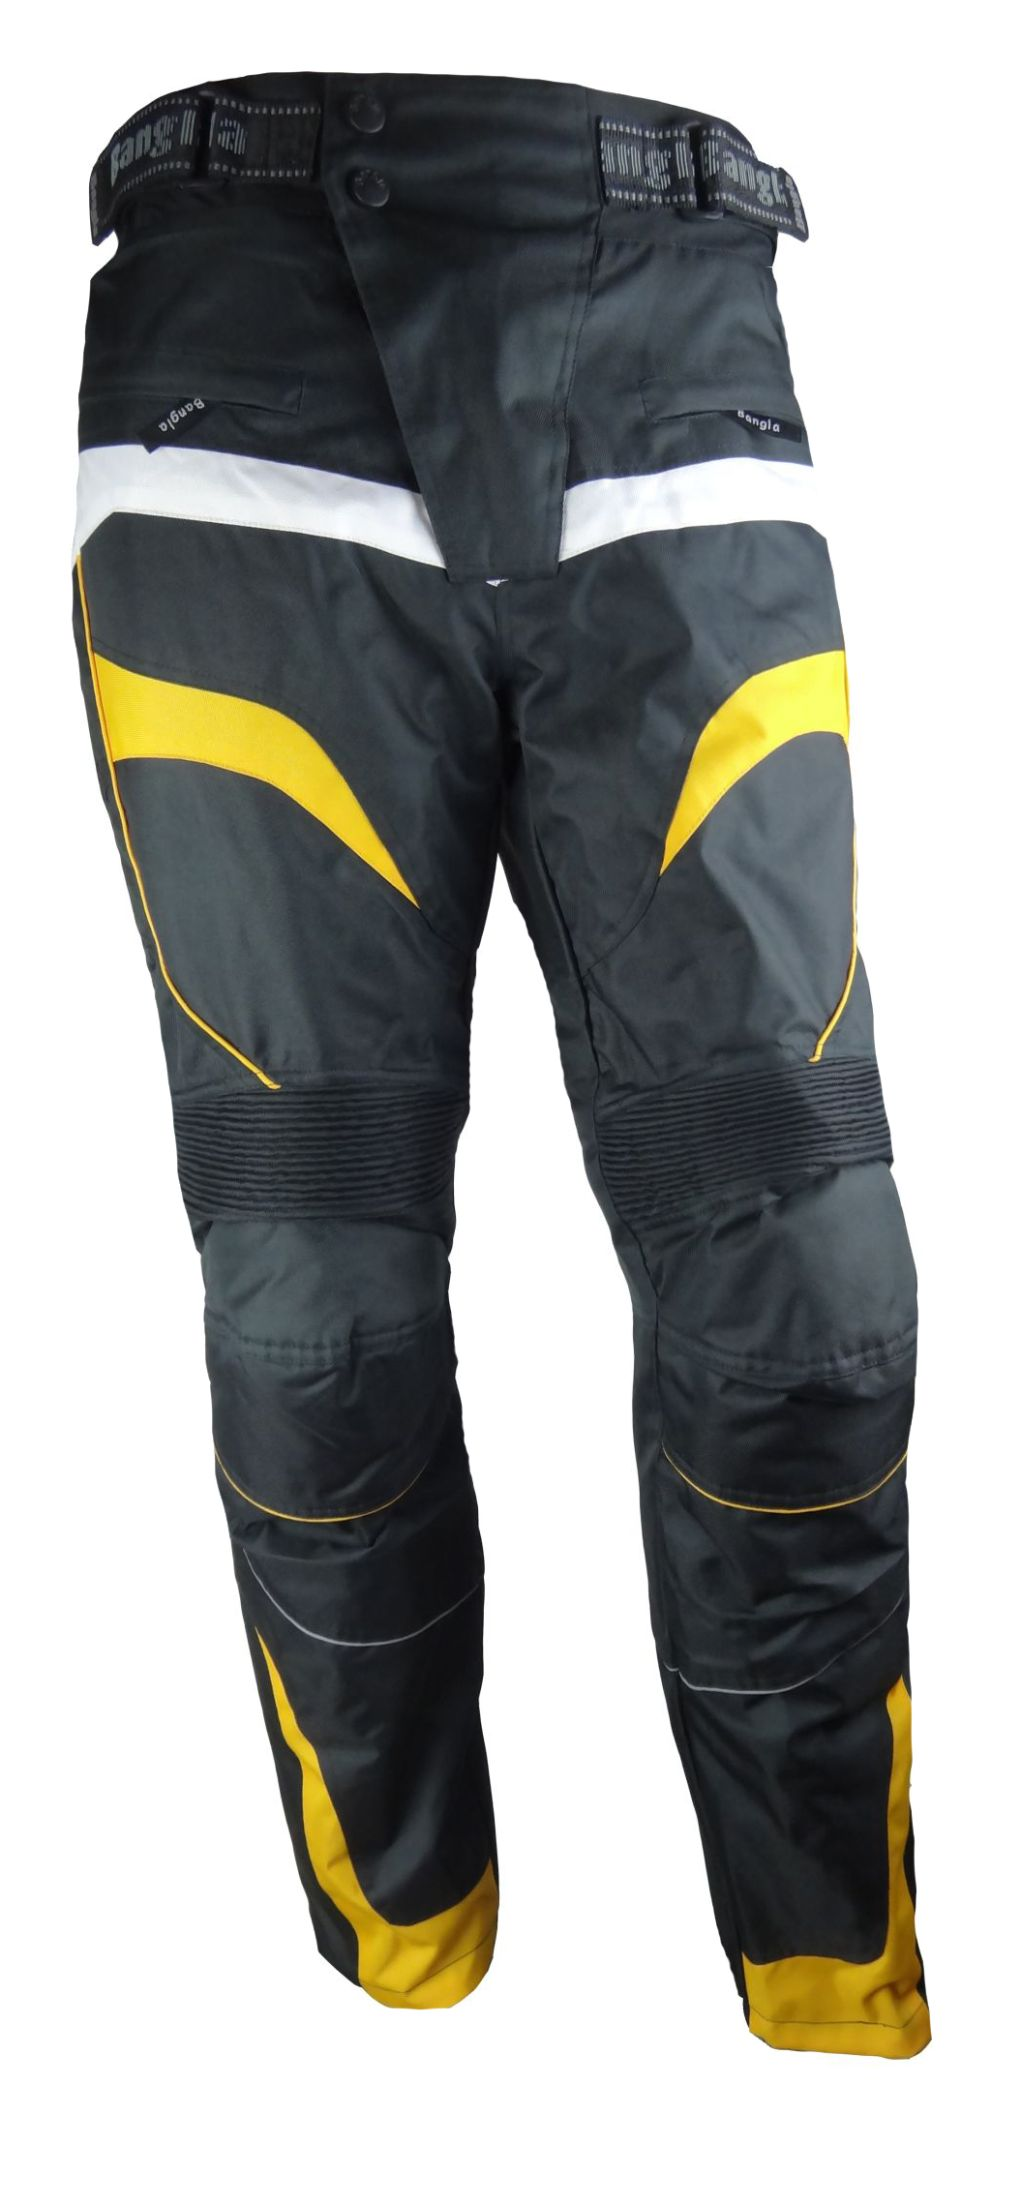 Bangla Motorrad Hose Motorradhose Textil  Cordura schwarz gelb S - 6 XL